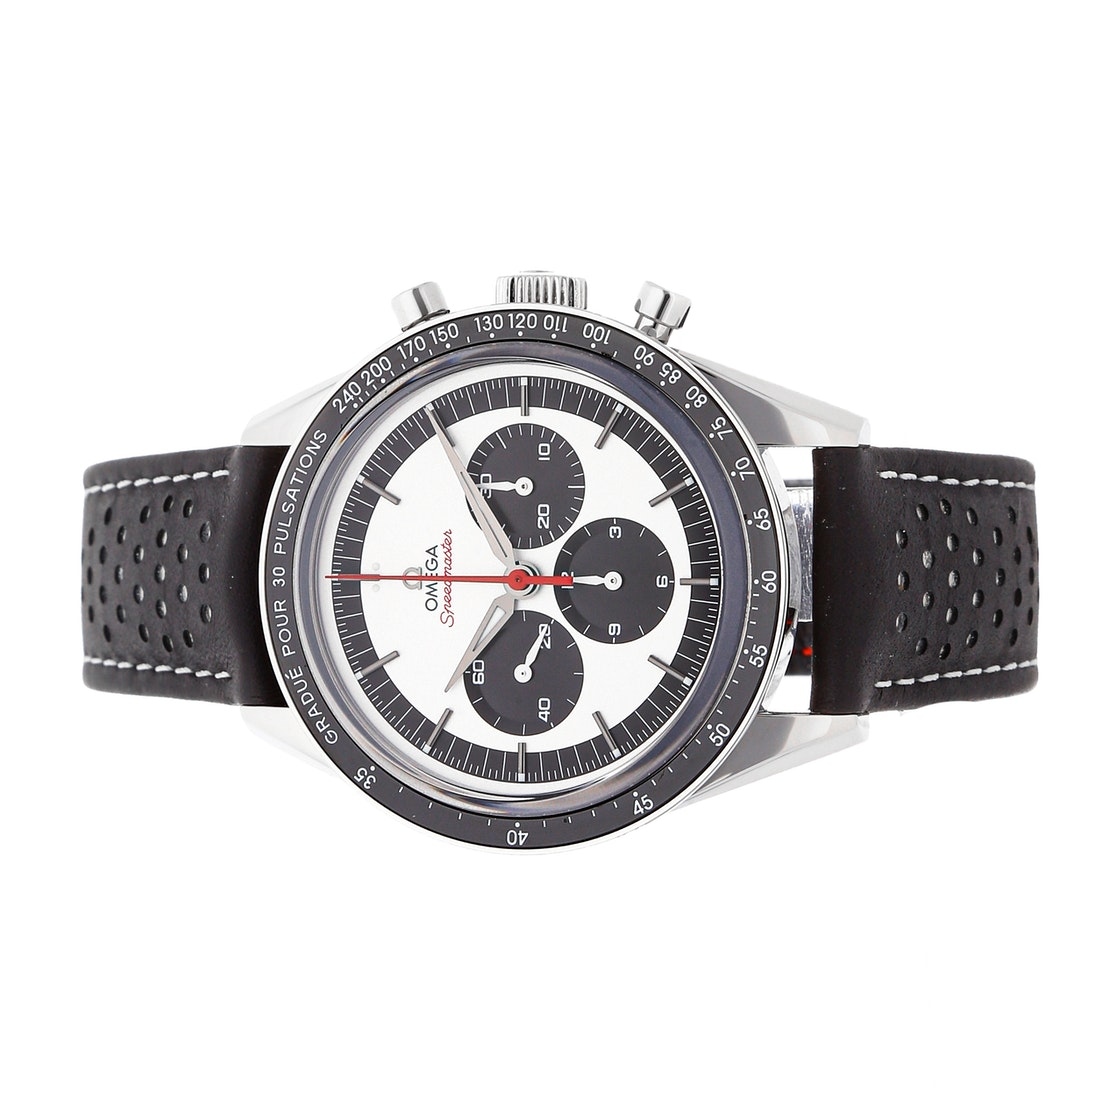 Omega Speedmaster Moonwatch Chronograph CK 2998 Limited Edition 311.32.40.30.02.001